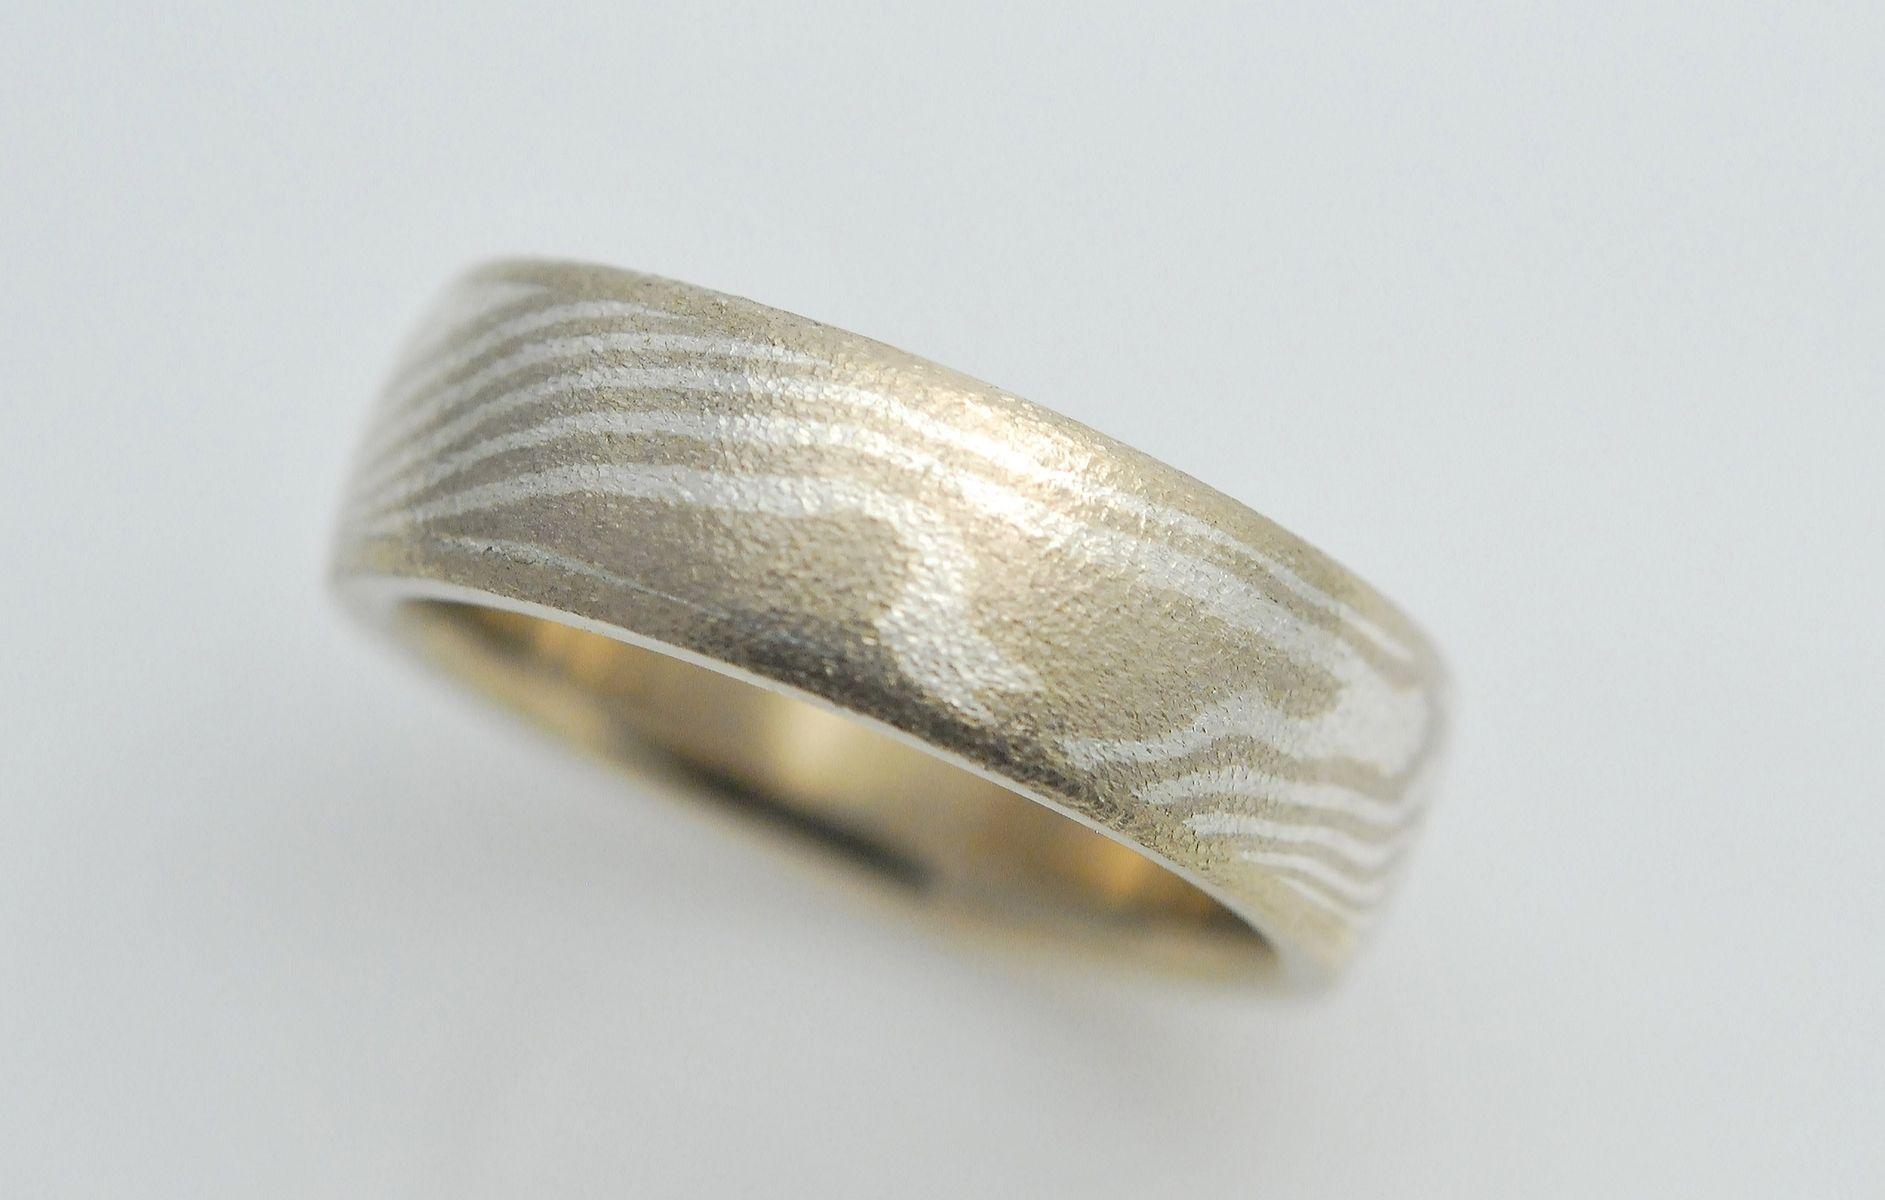 Custom Made 14k Palladium White Gold With Sterling Silver Moe Gane Ring